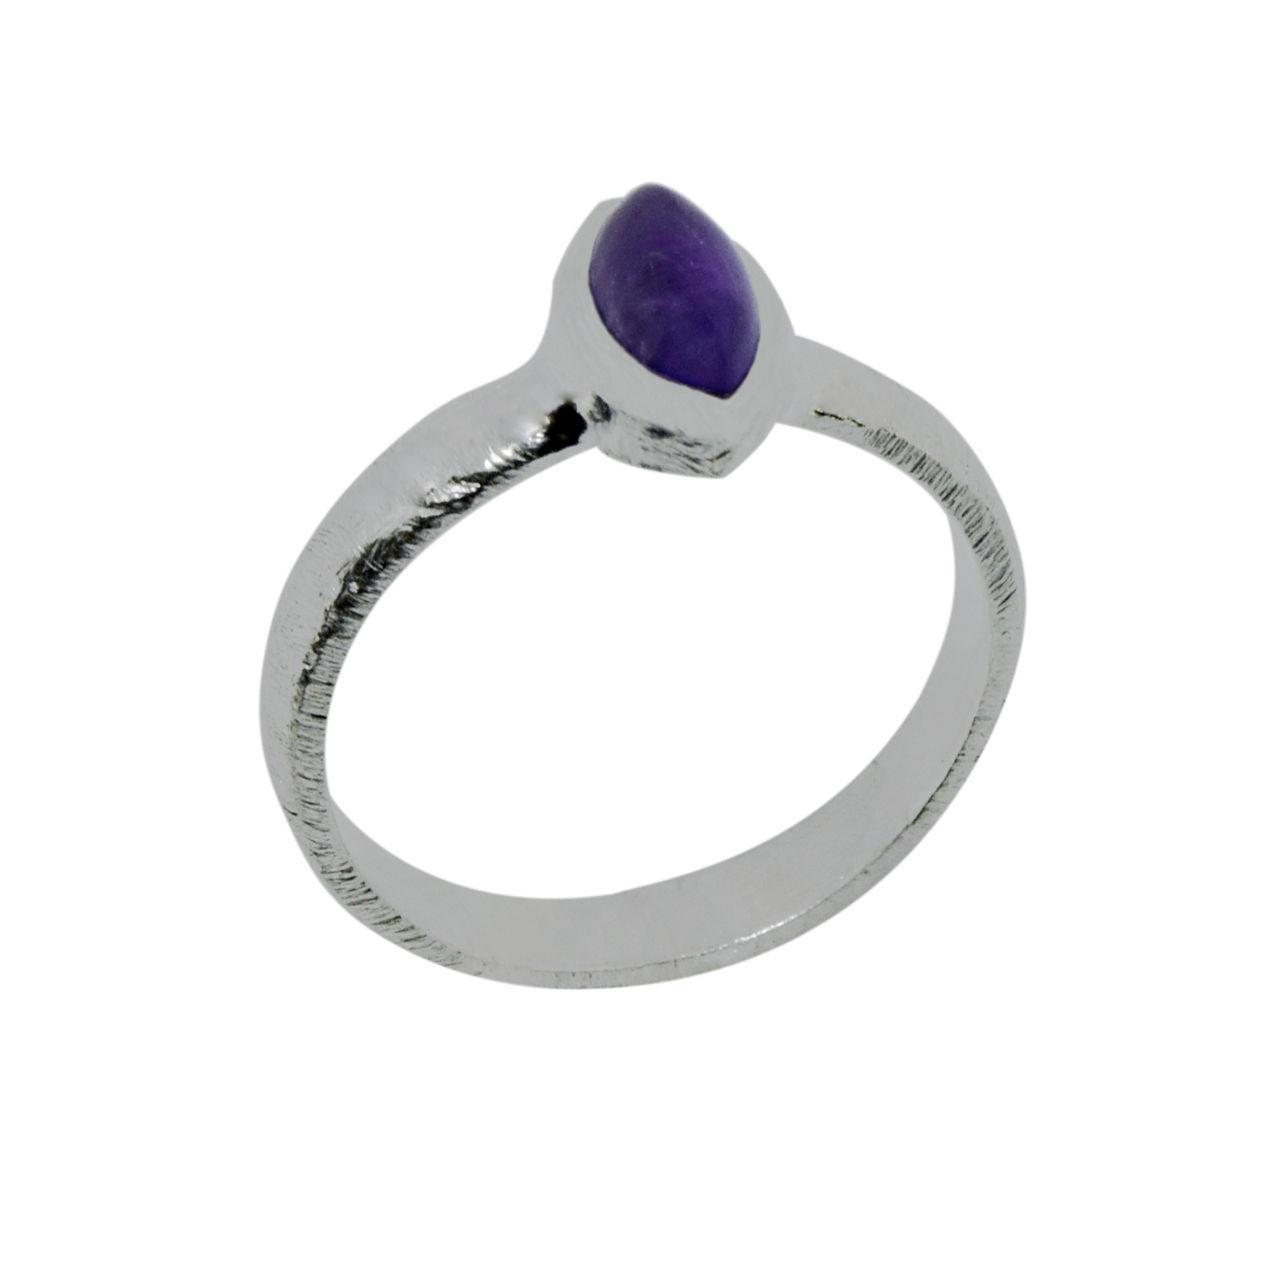 Marquise Amethyst Gemstone Solid 925 Sterling Silver Jewelry Ring Sz 6 SHRI0312